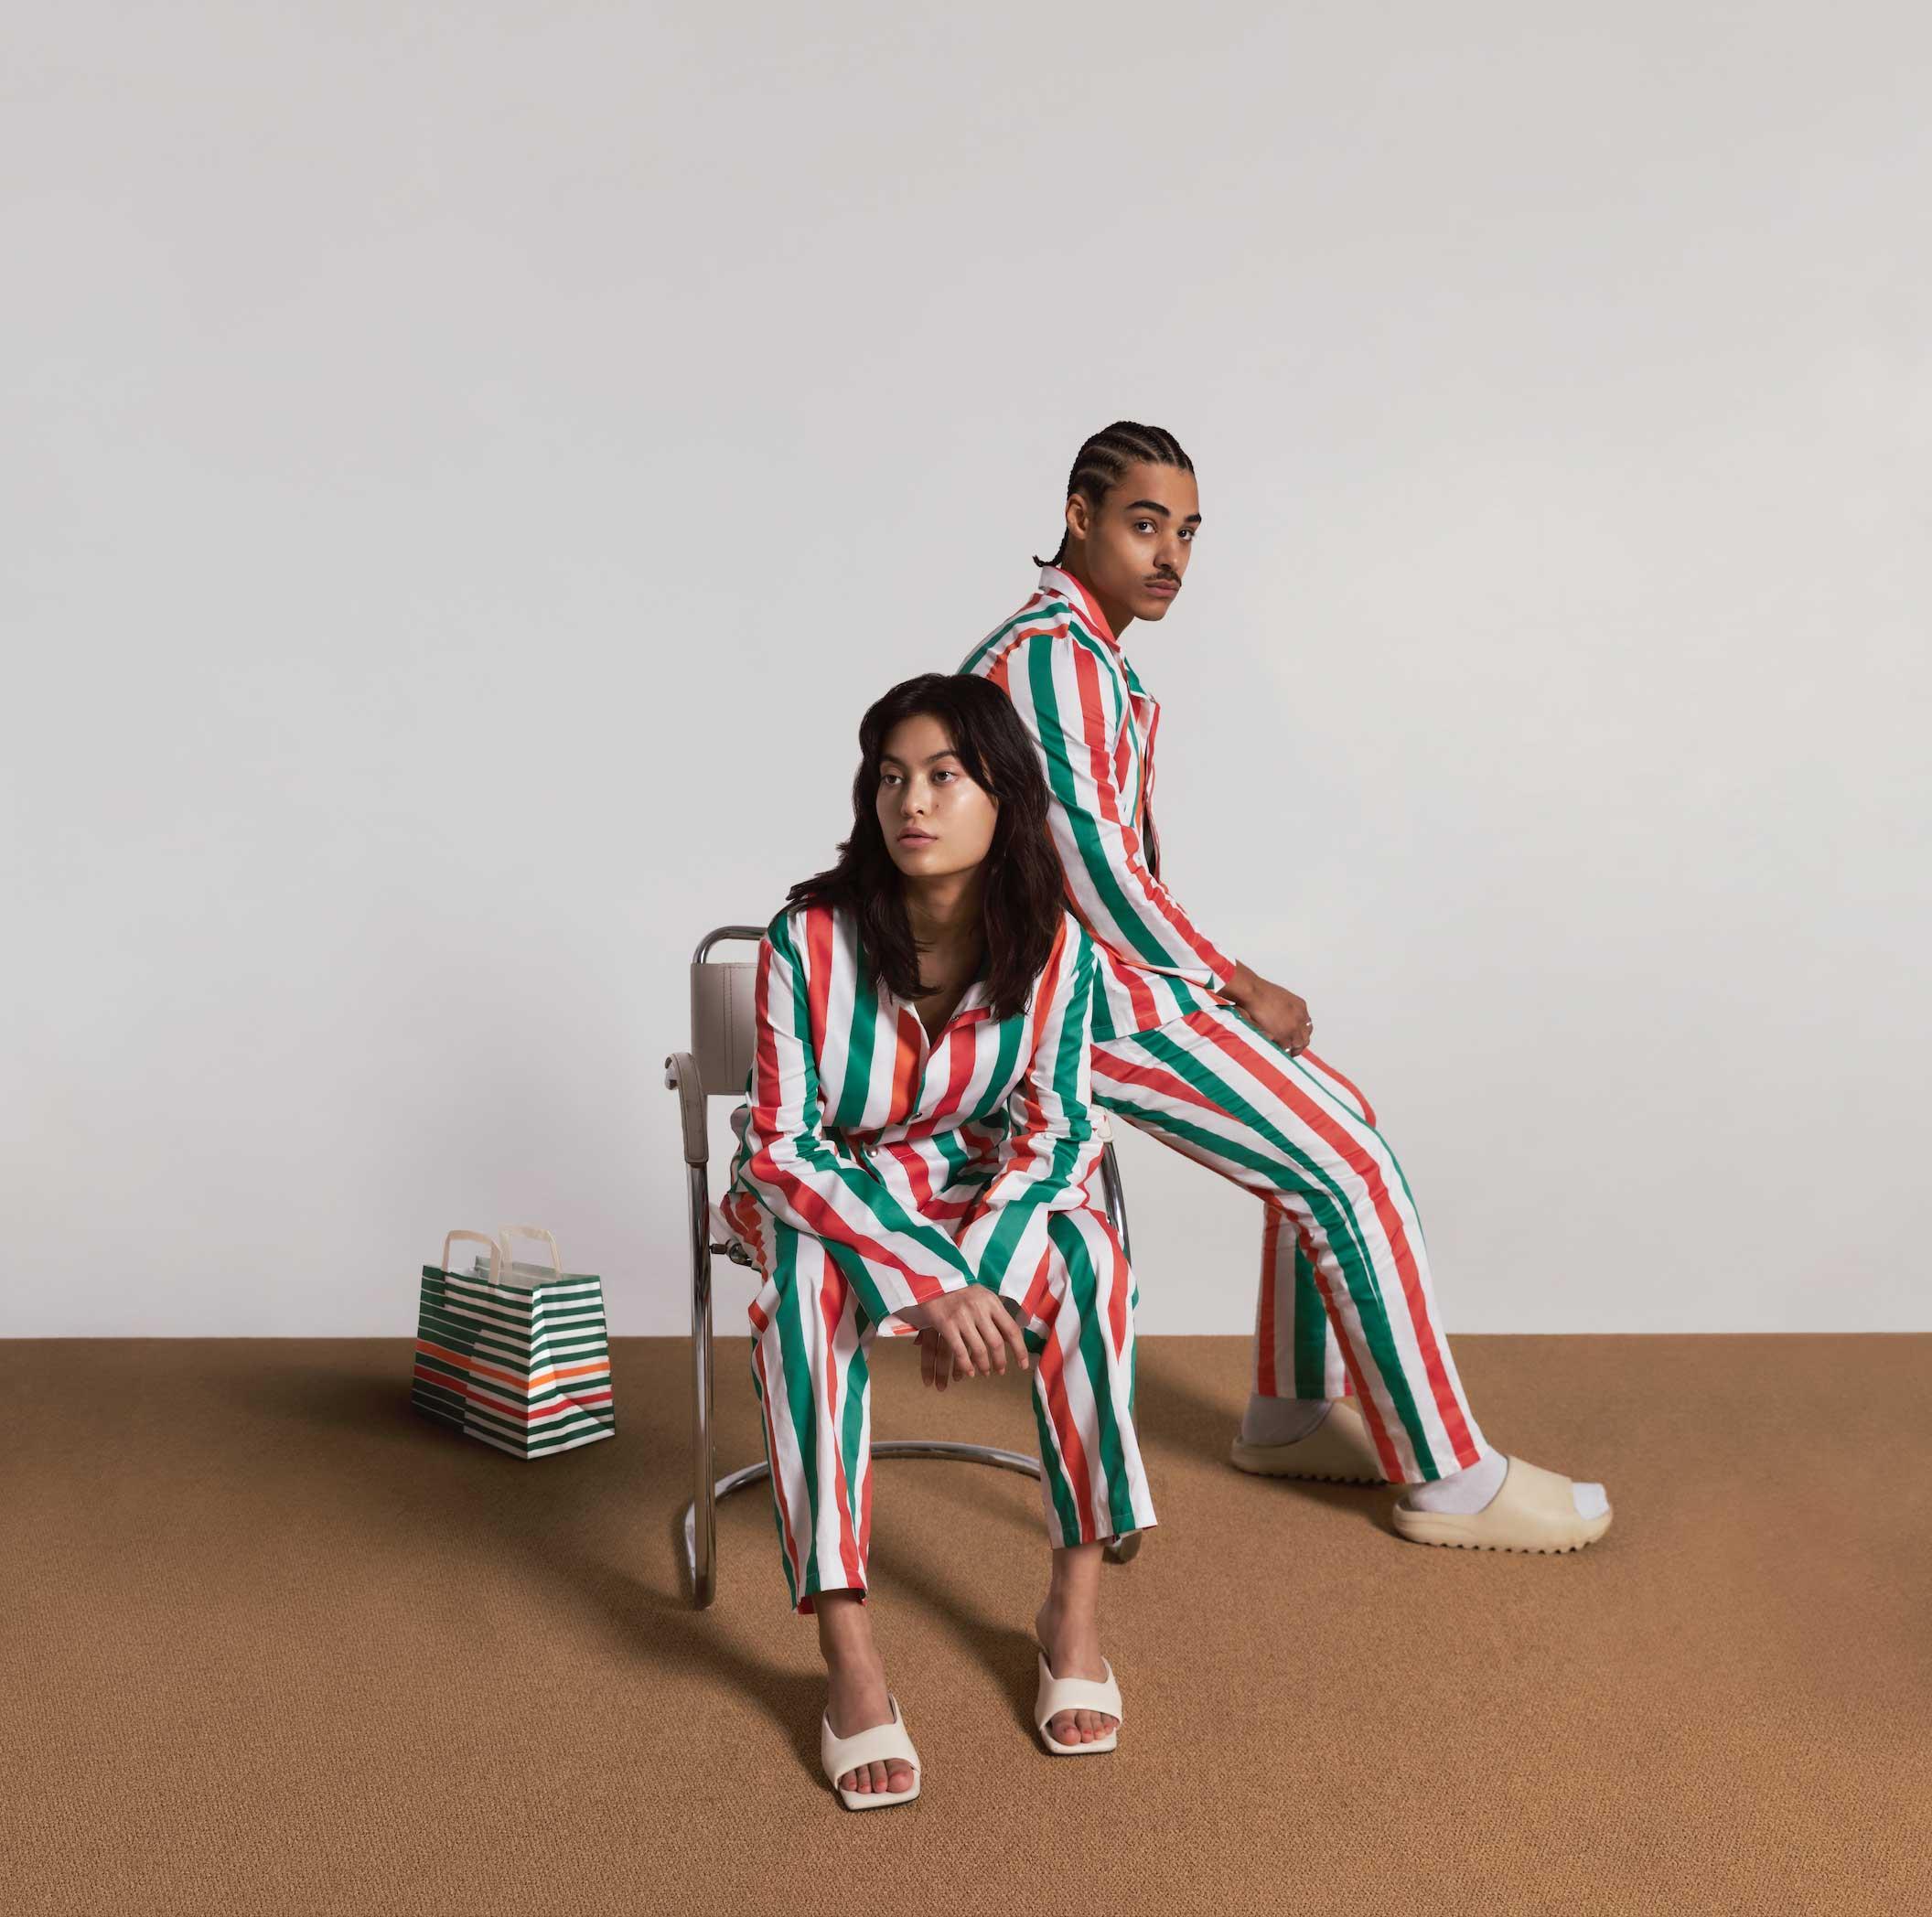 7-Eleven pyjamas